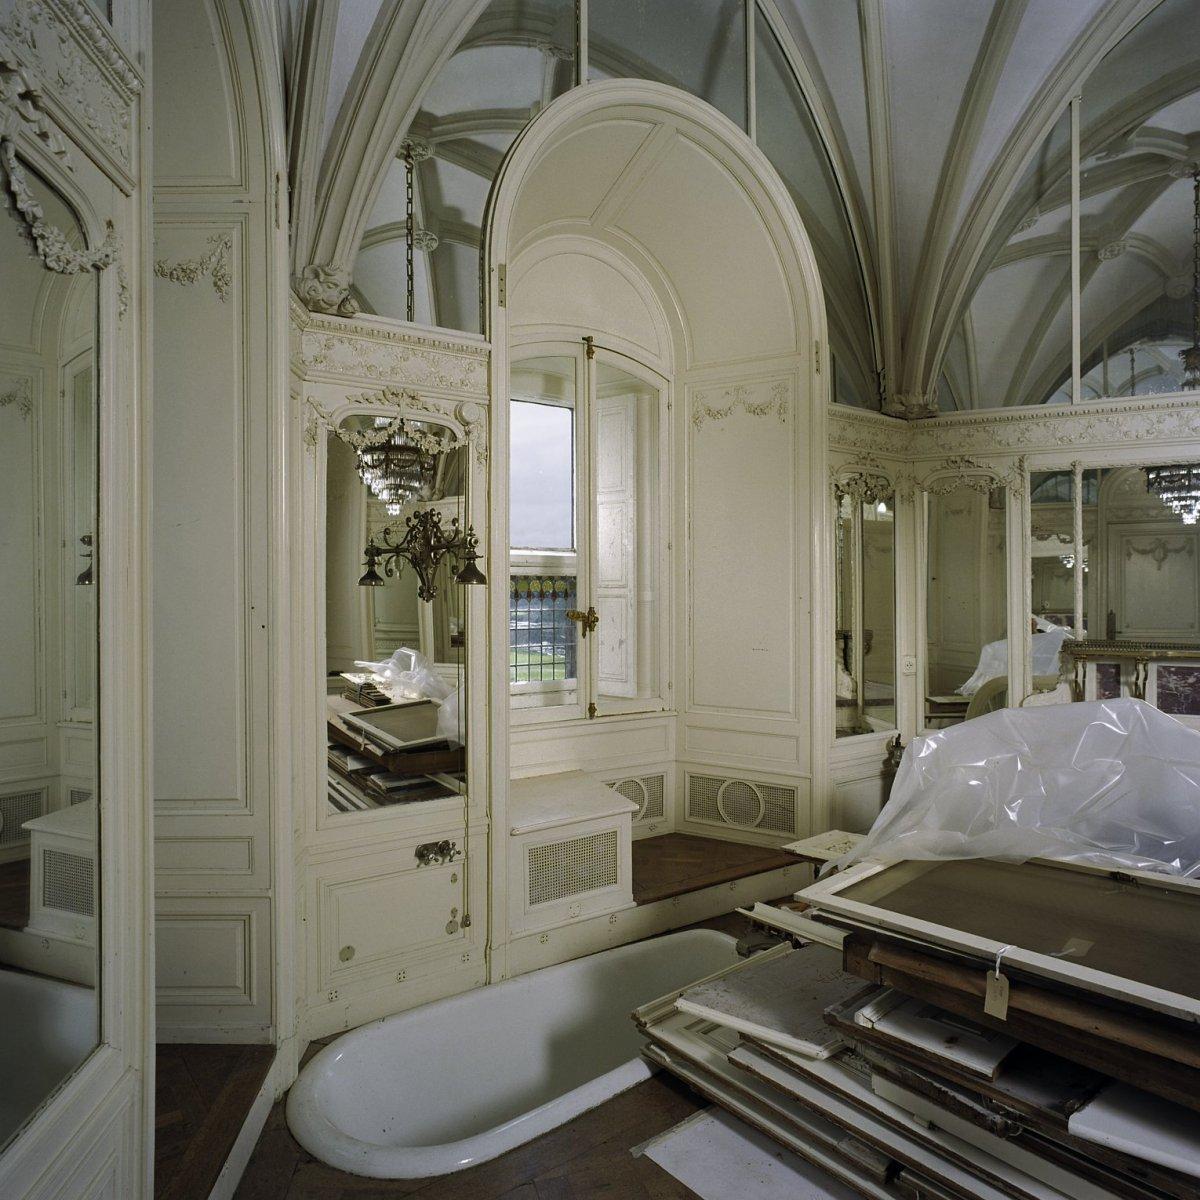 File vertrek badkamer bij kamer 1 interieur met for Interieur badkamer